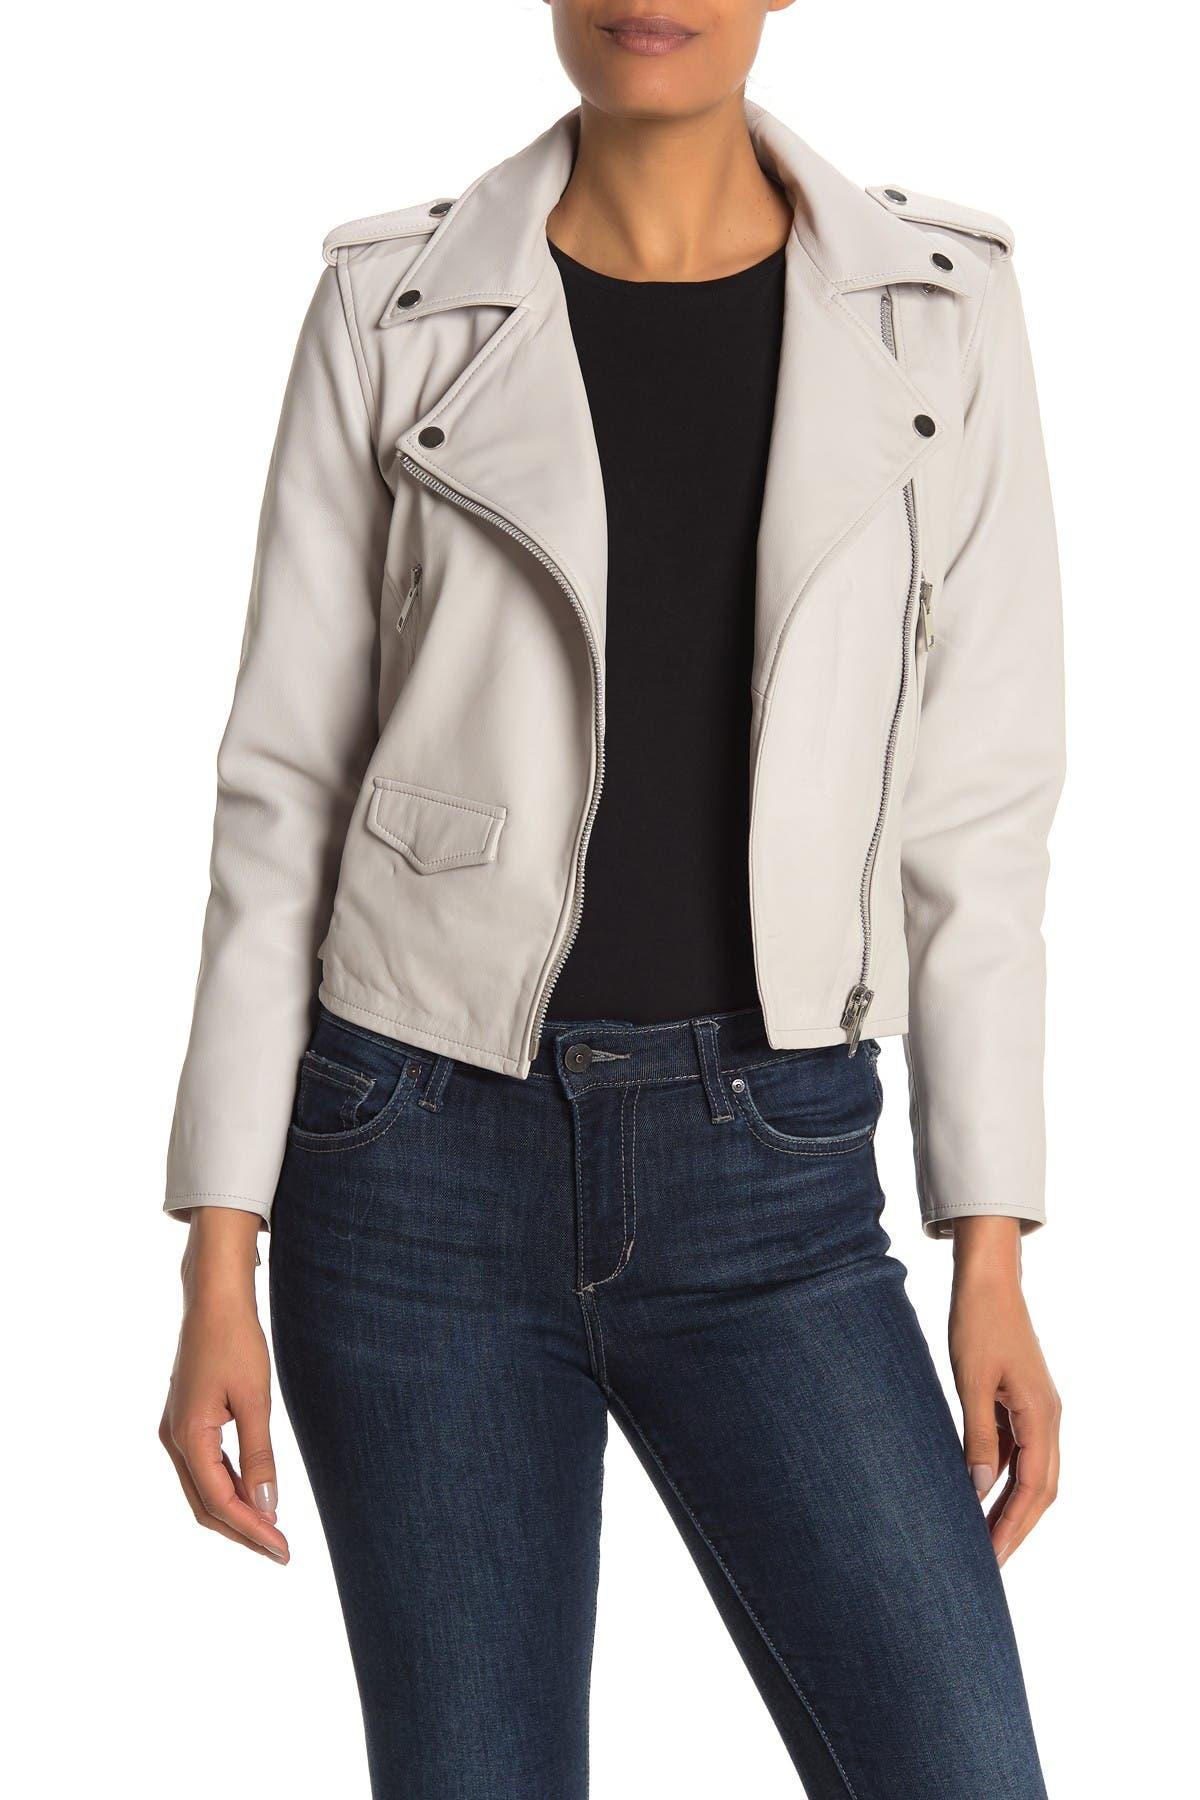 Image of Walter Baker Liz Leather Crop Moto Jacket